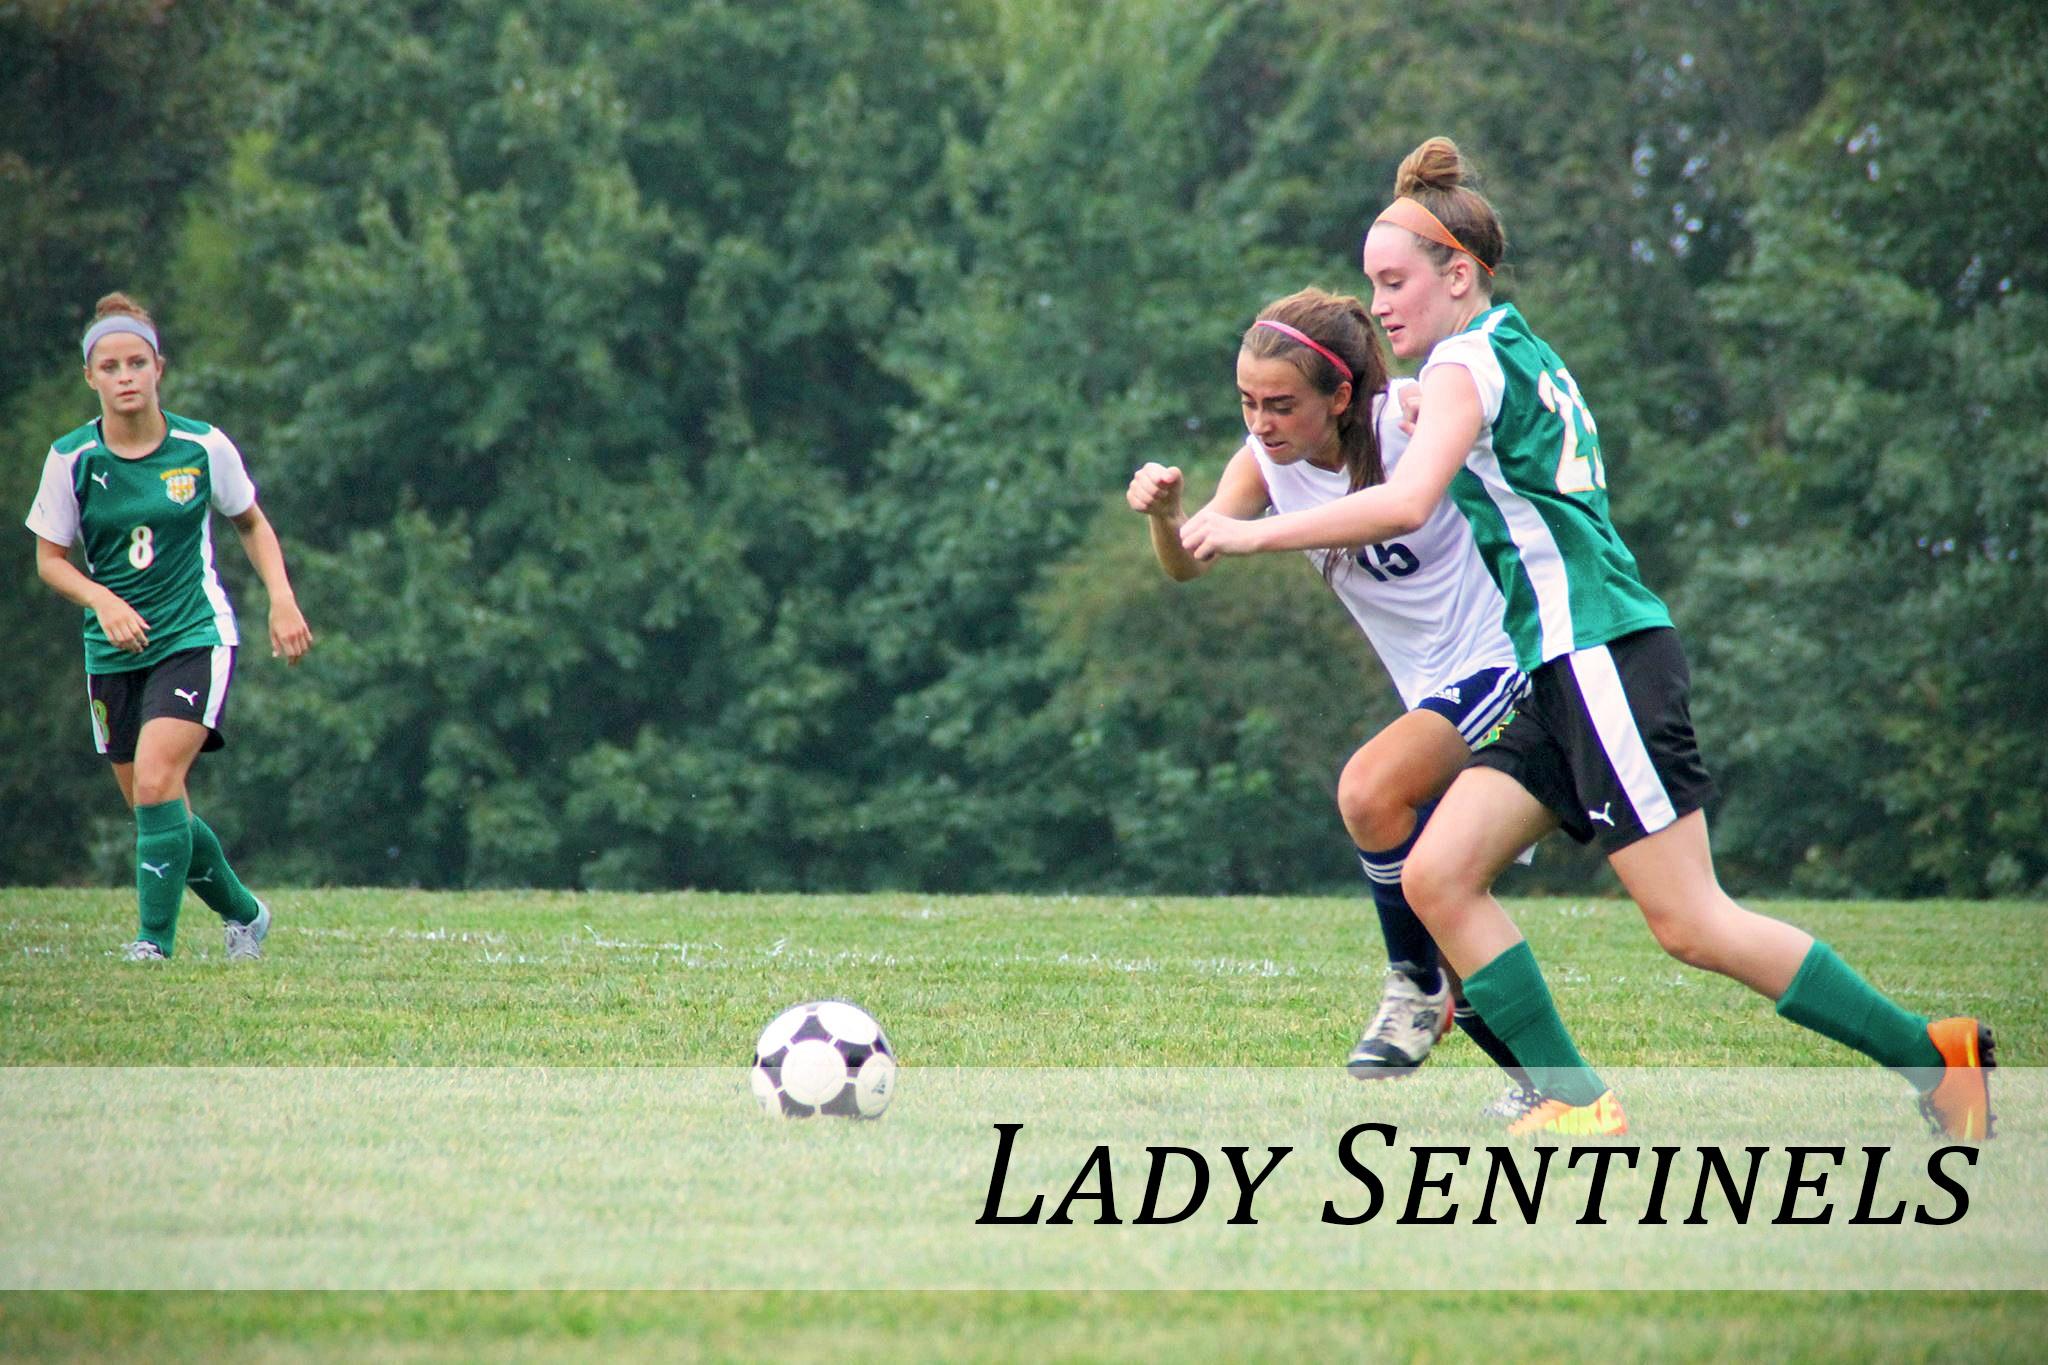 Women's Soccer Lady Sentinels.jpg